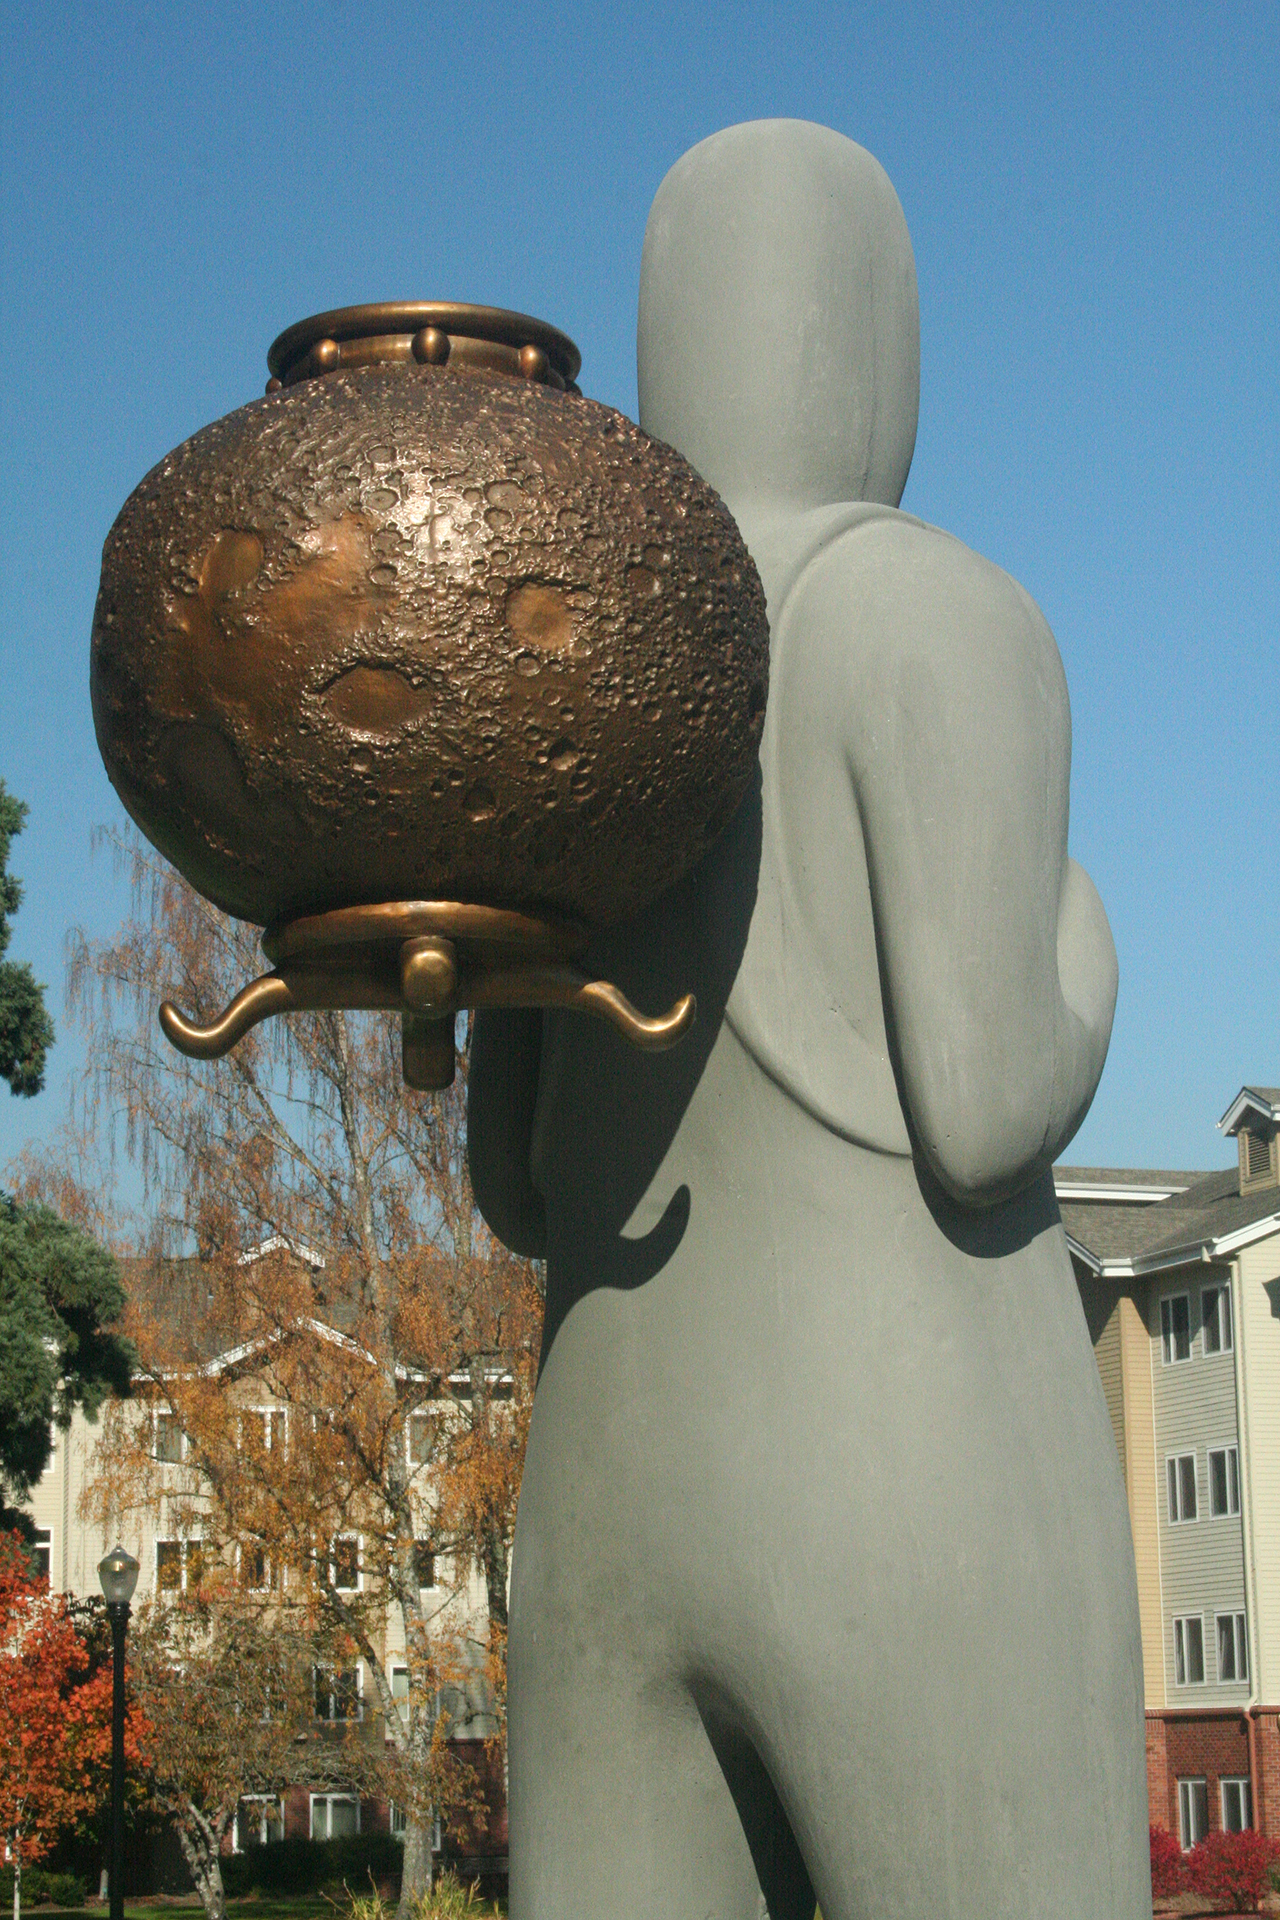 Asteriskos-colabstudio-vase-publicart-whatweholddear-bronze-cast.jpg